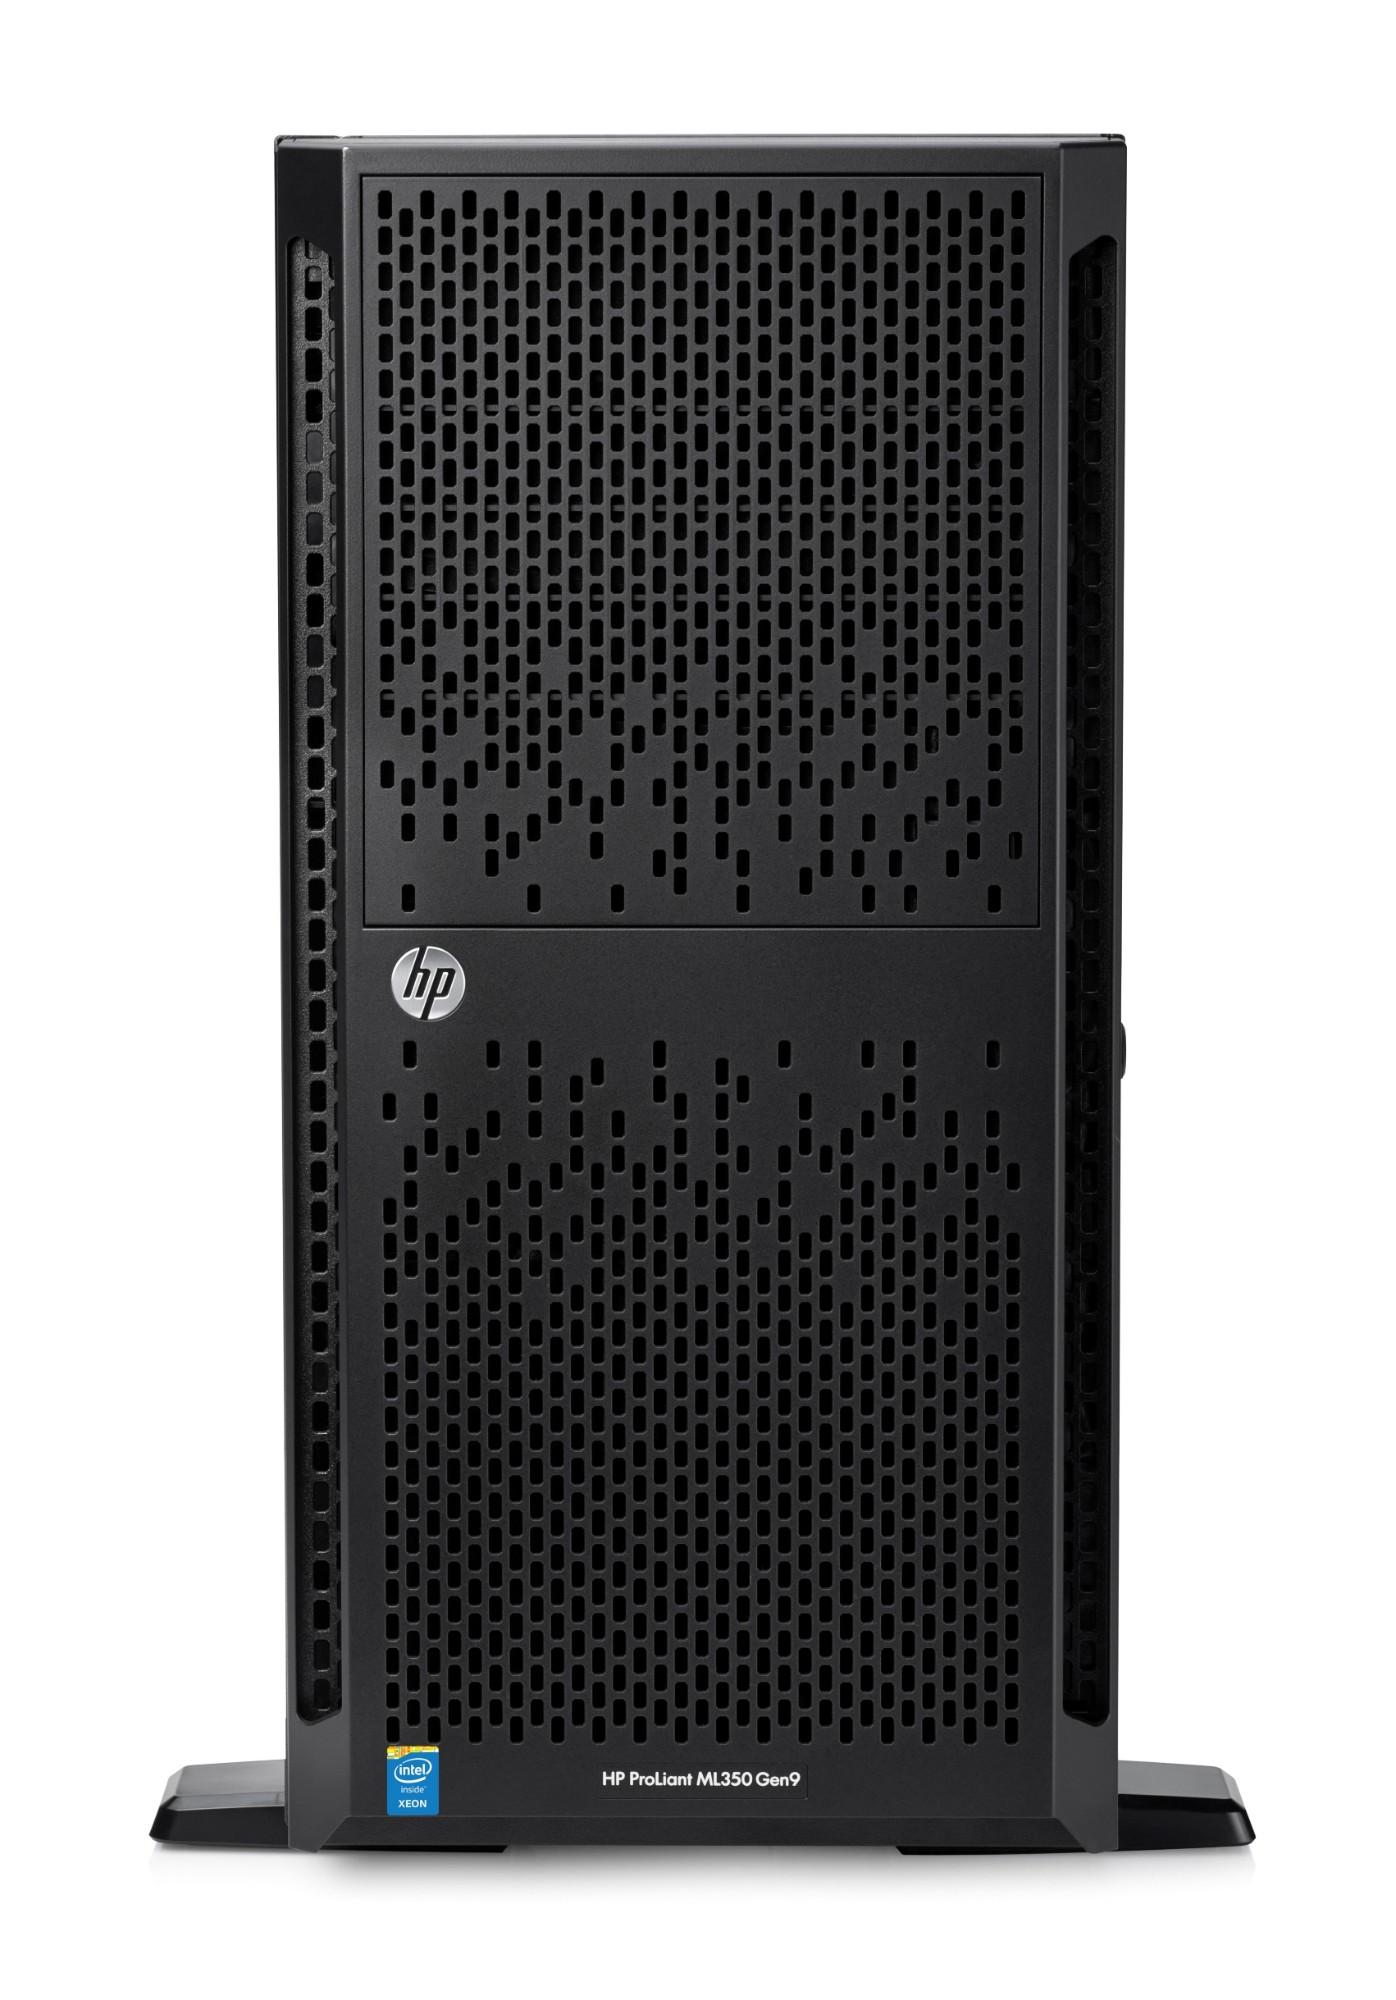 Hewlett Packard Enterprise ProLiant ML350 Gen9 2.1GHz E5-2620V4 500W Tower (5U) server